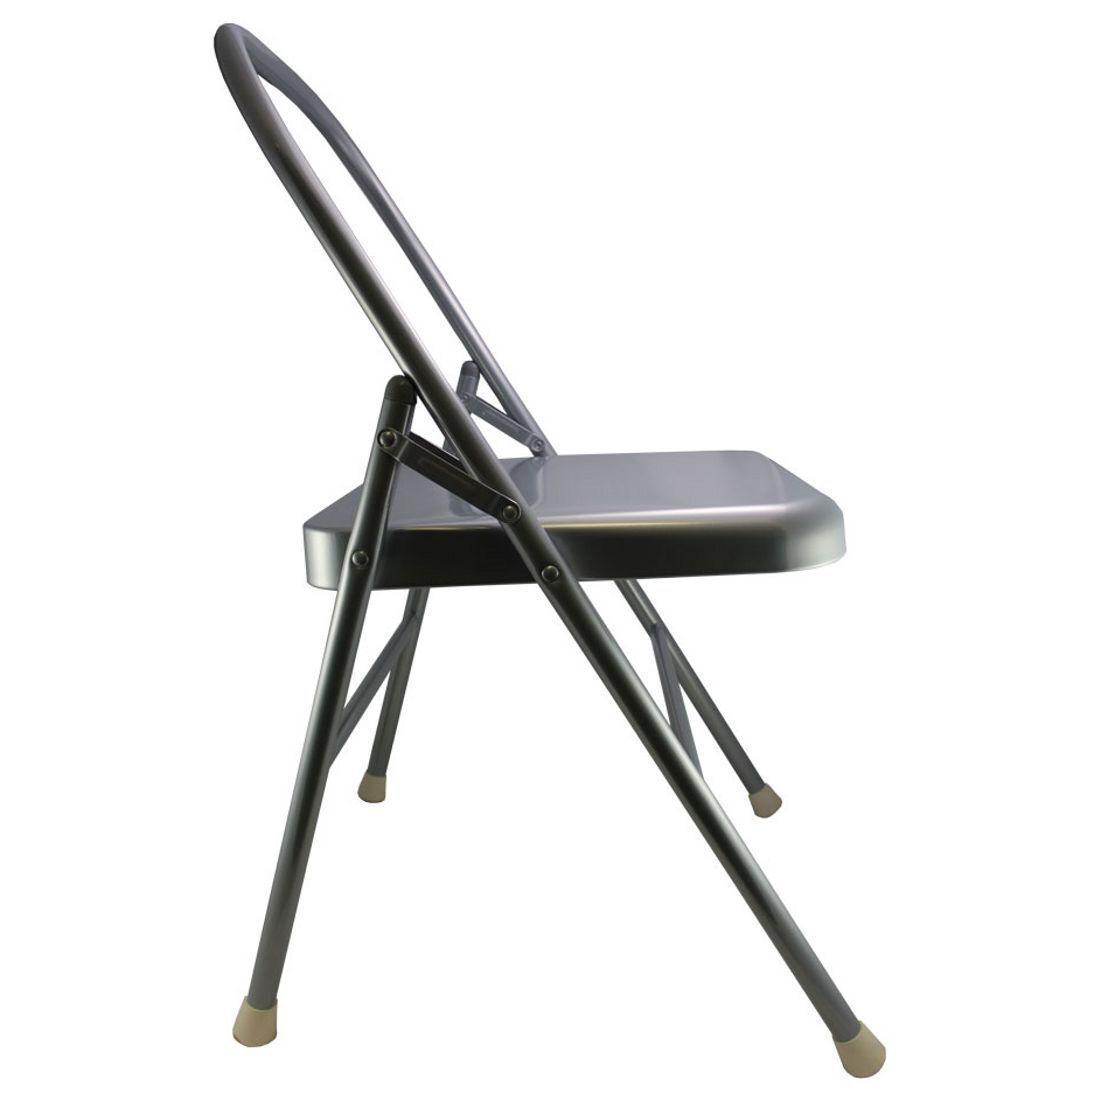 Yoga Mad Reinforced Folding Yoga Chair